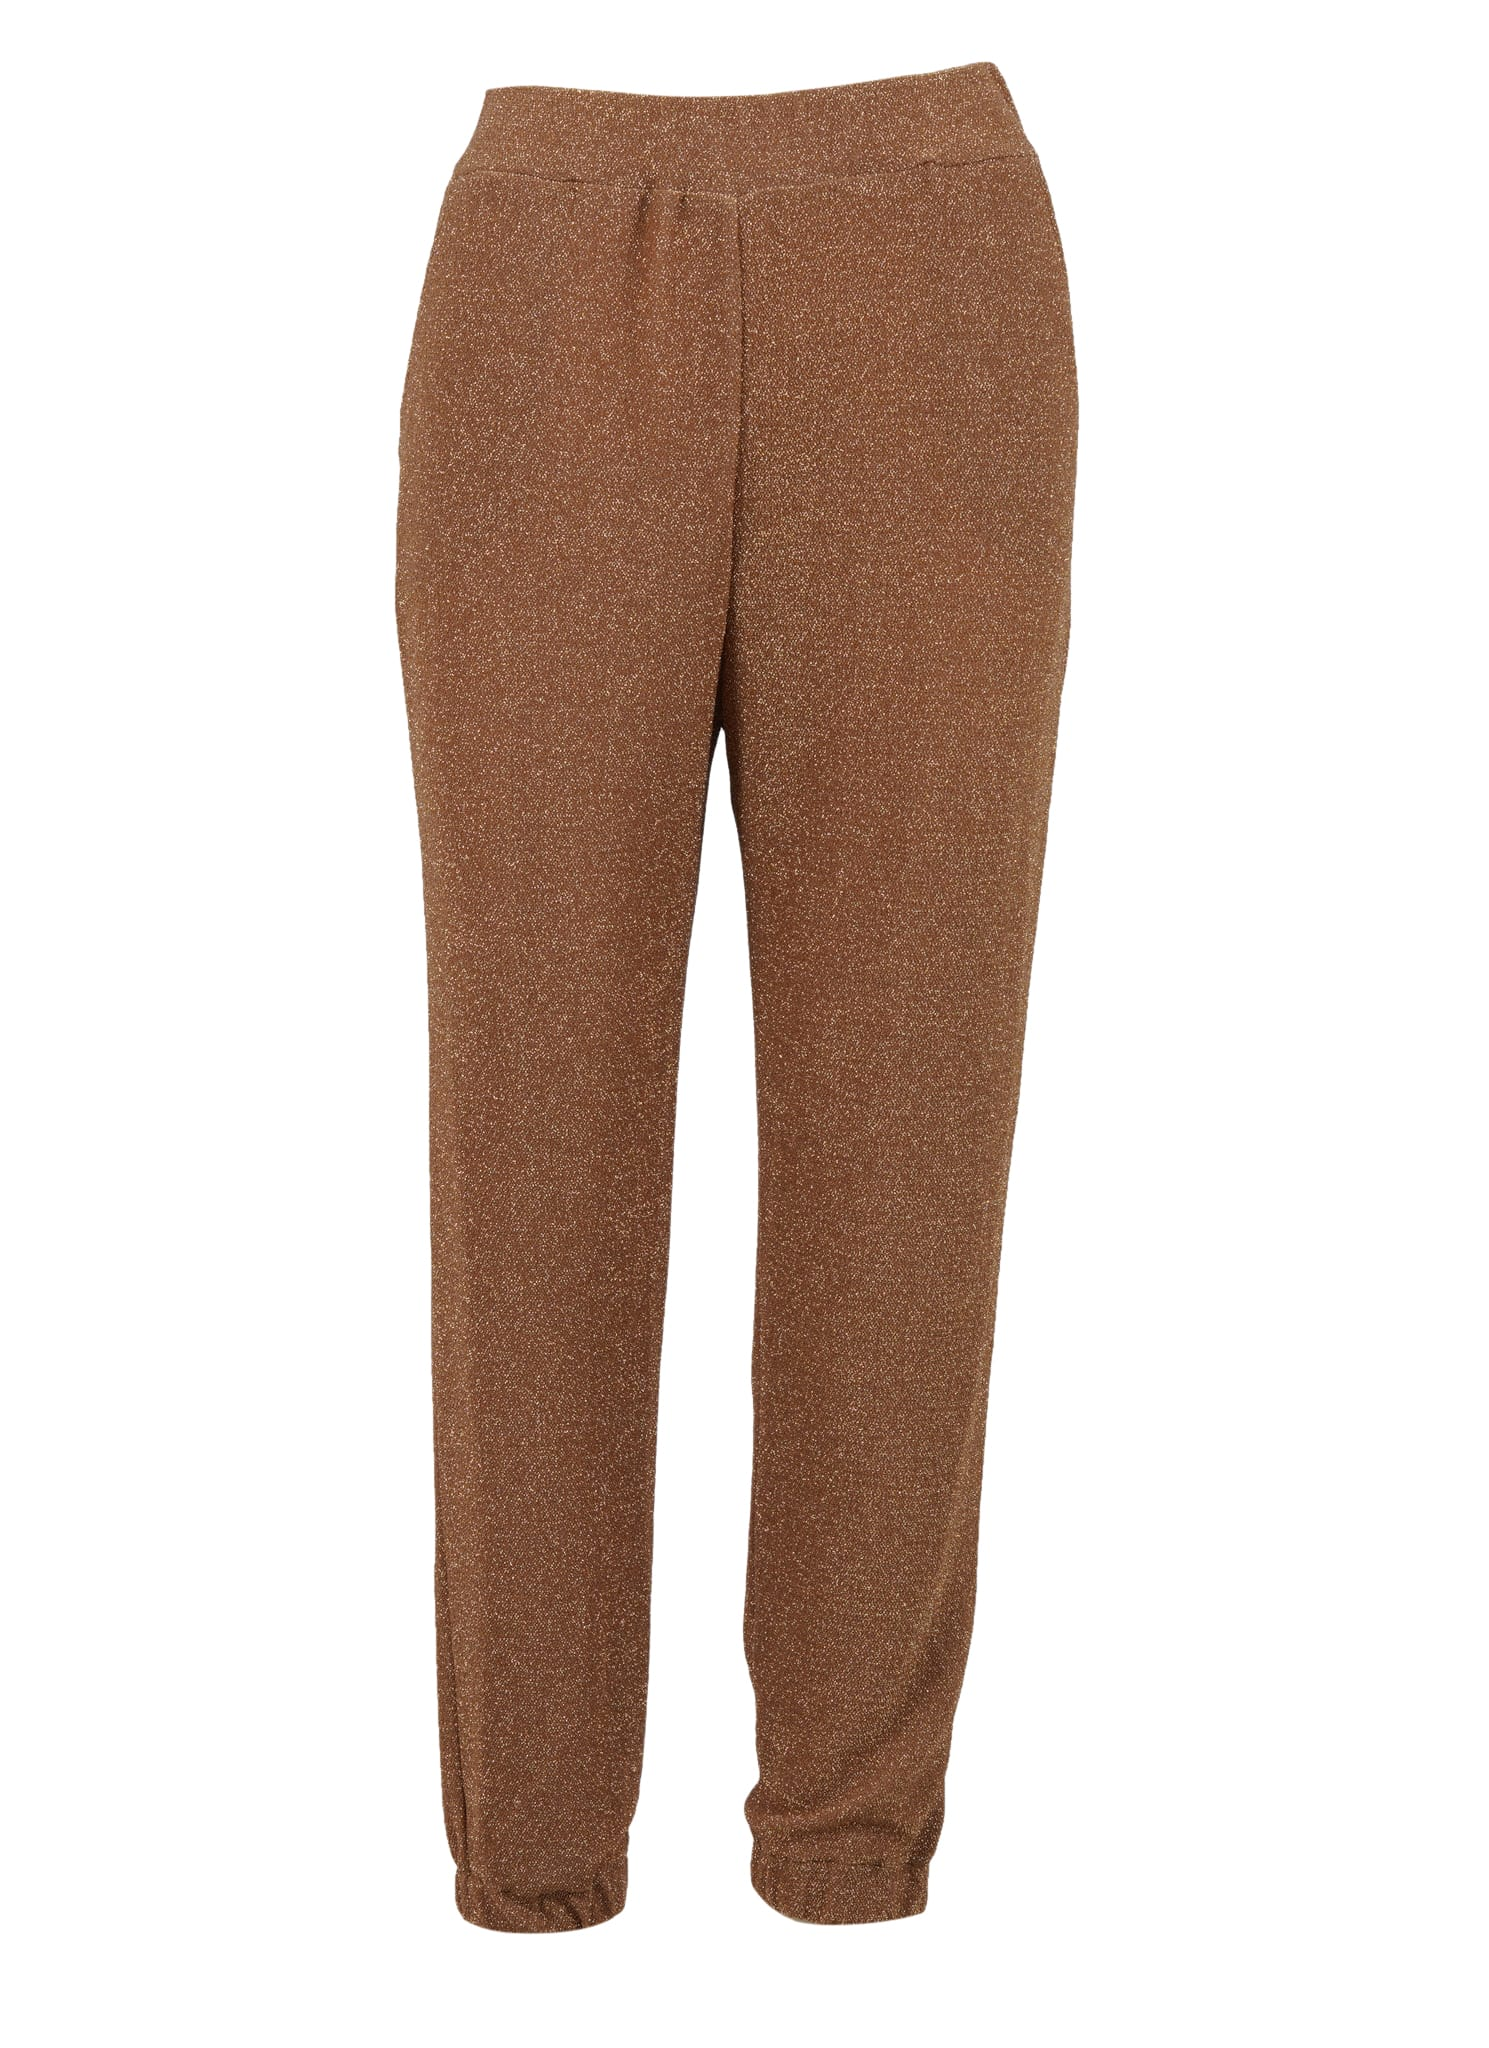 Lurex Trousers